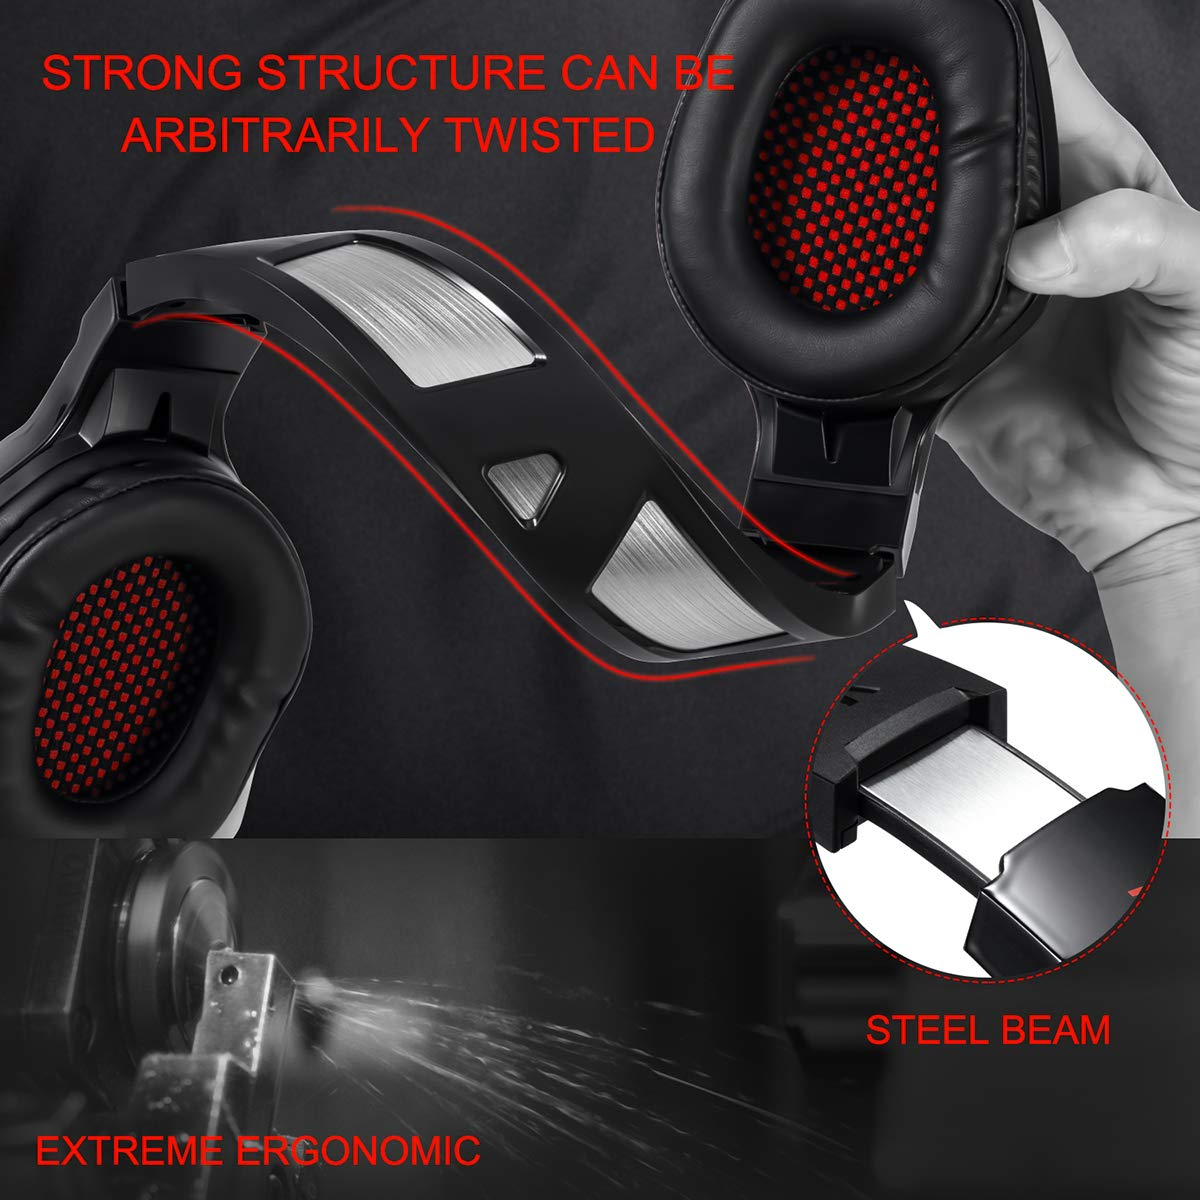 Auriculares Gaming, LATEC Cascos Gaming Microfono para PS4 Xbox One S , PC, Computadora Portátil Sonido Envolvente Estéreo Cancelación de ruido en los auriculares con memoria suave, luz LED